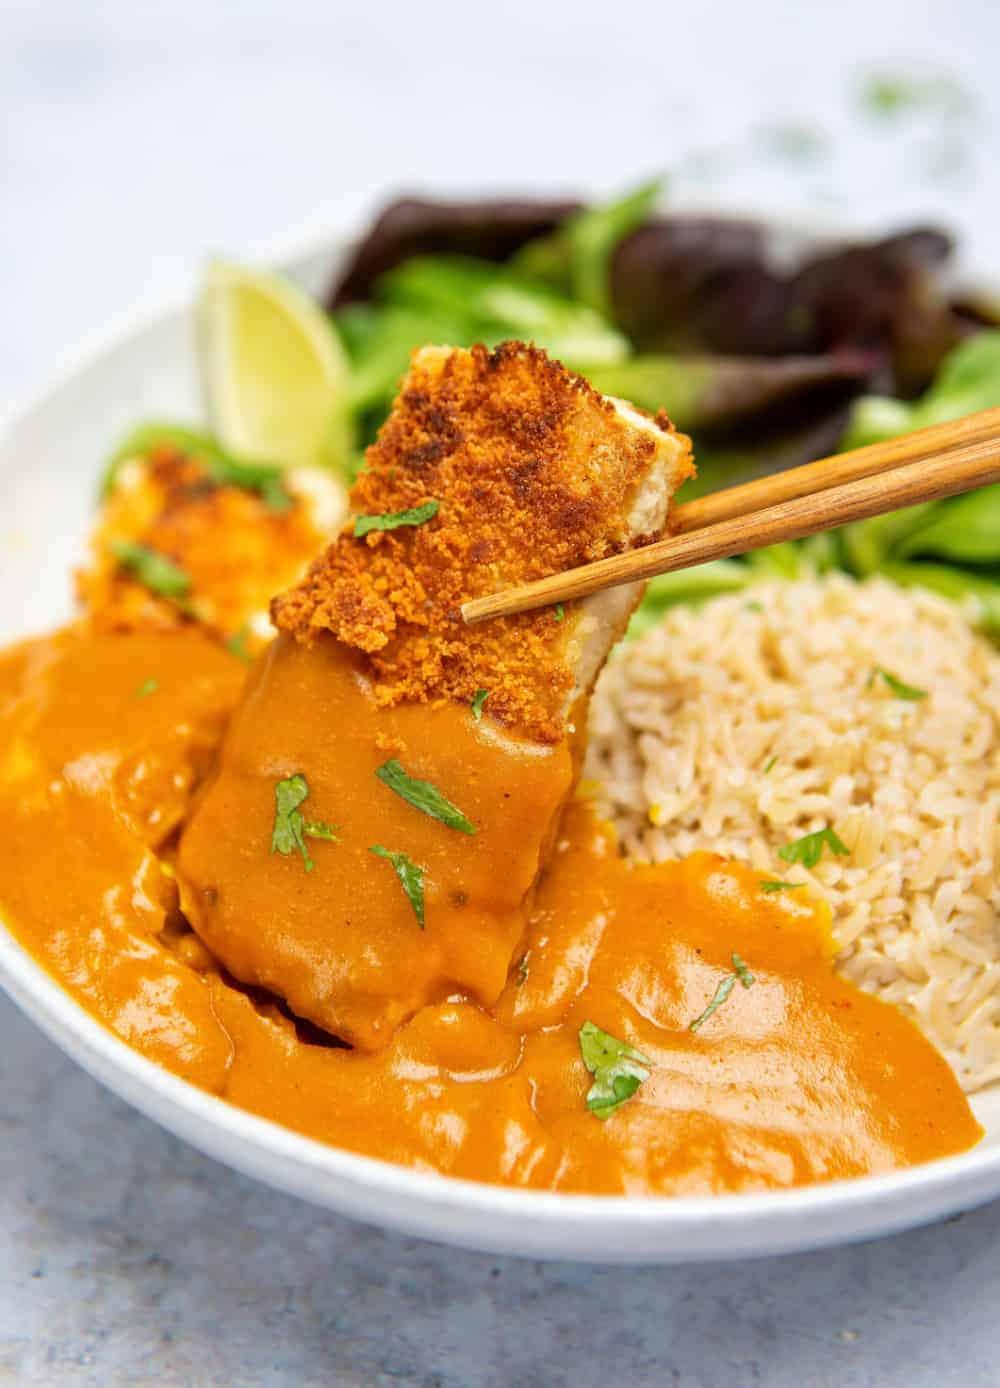 Crispy gluten free tofu